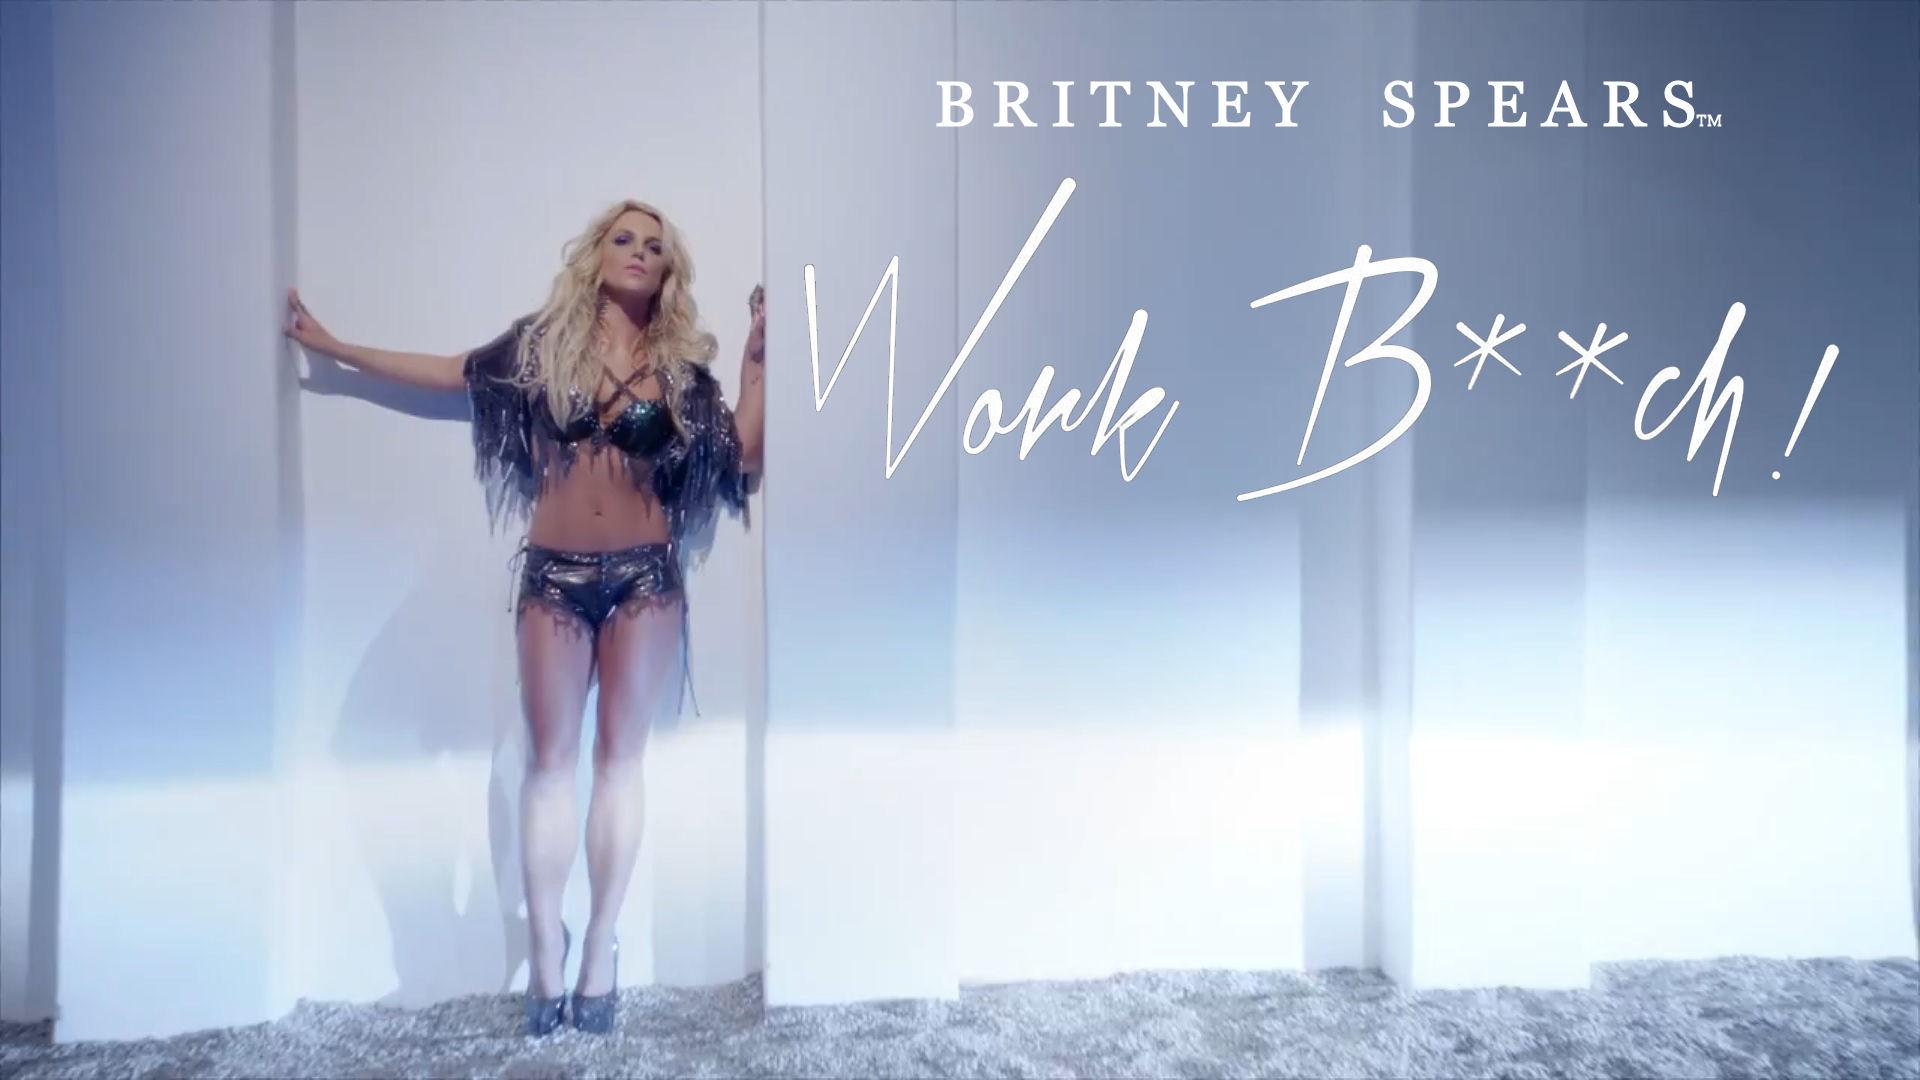 image Britney spears work bitch feat kayden kross pmv